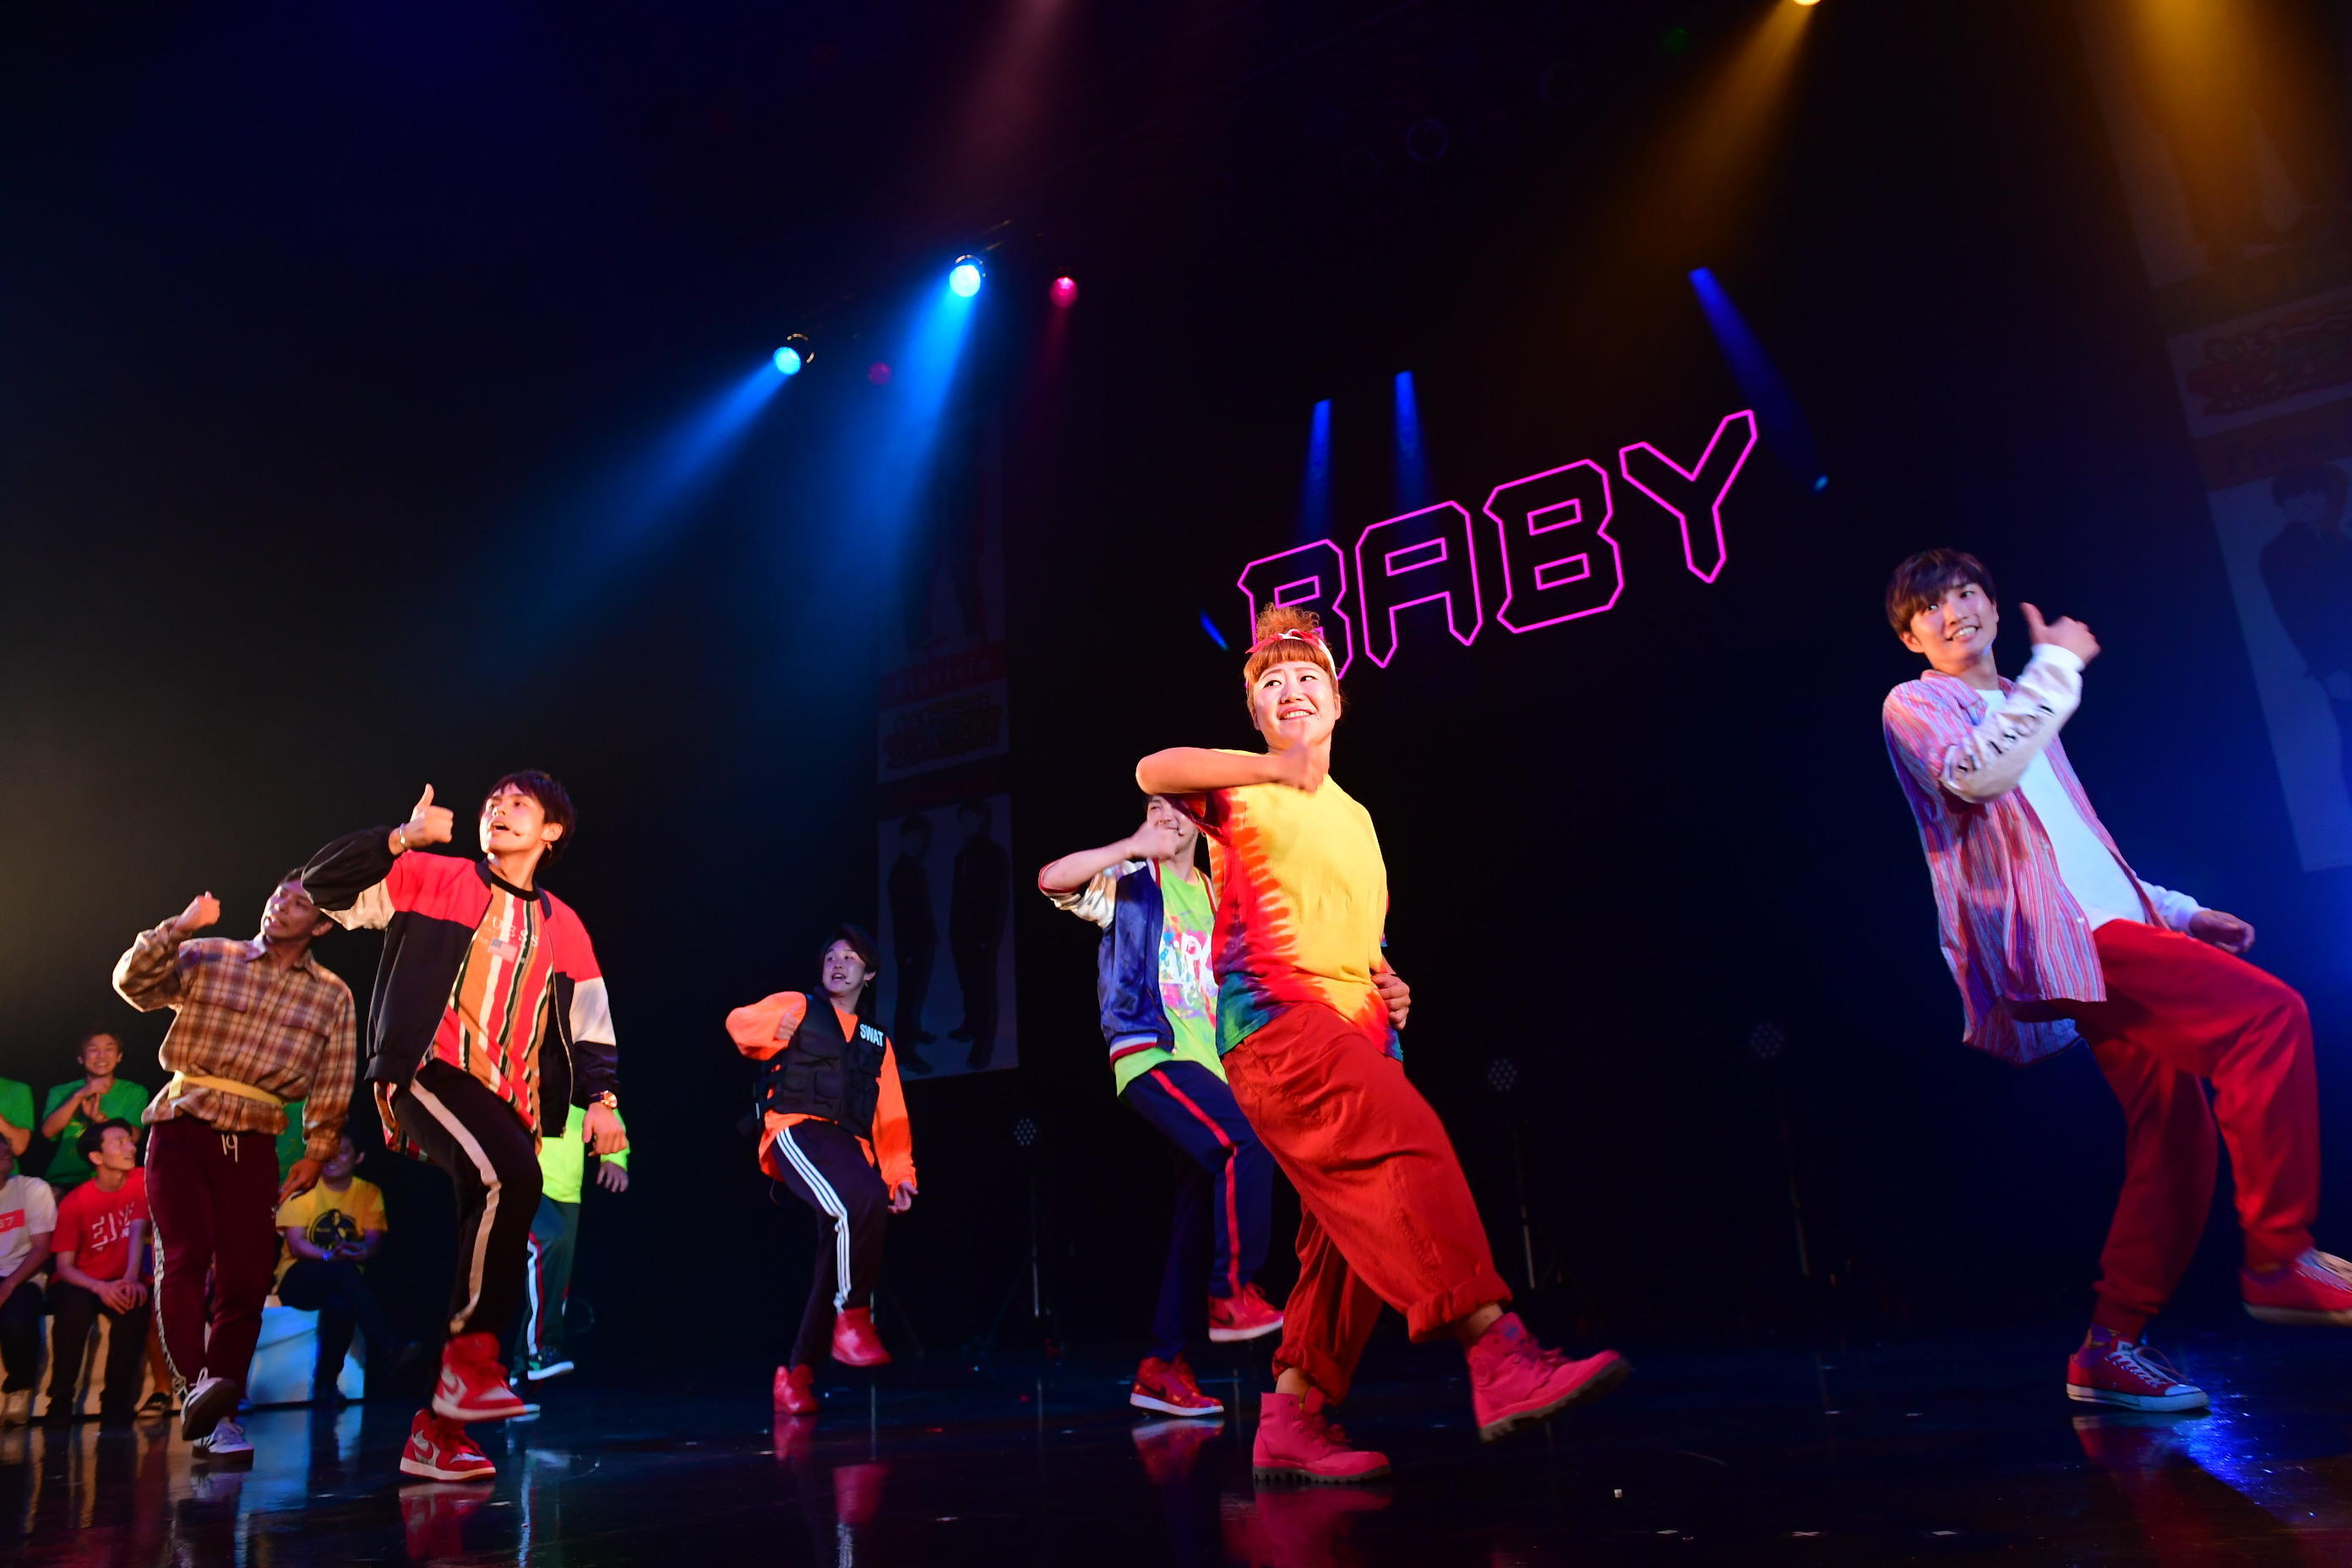 http://news.yoshimoto.co.jp/20180803012336-5b2b2c1aadb1d0928da0db70232d81362081a1e3.jpg